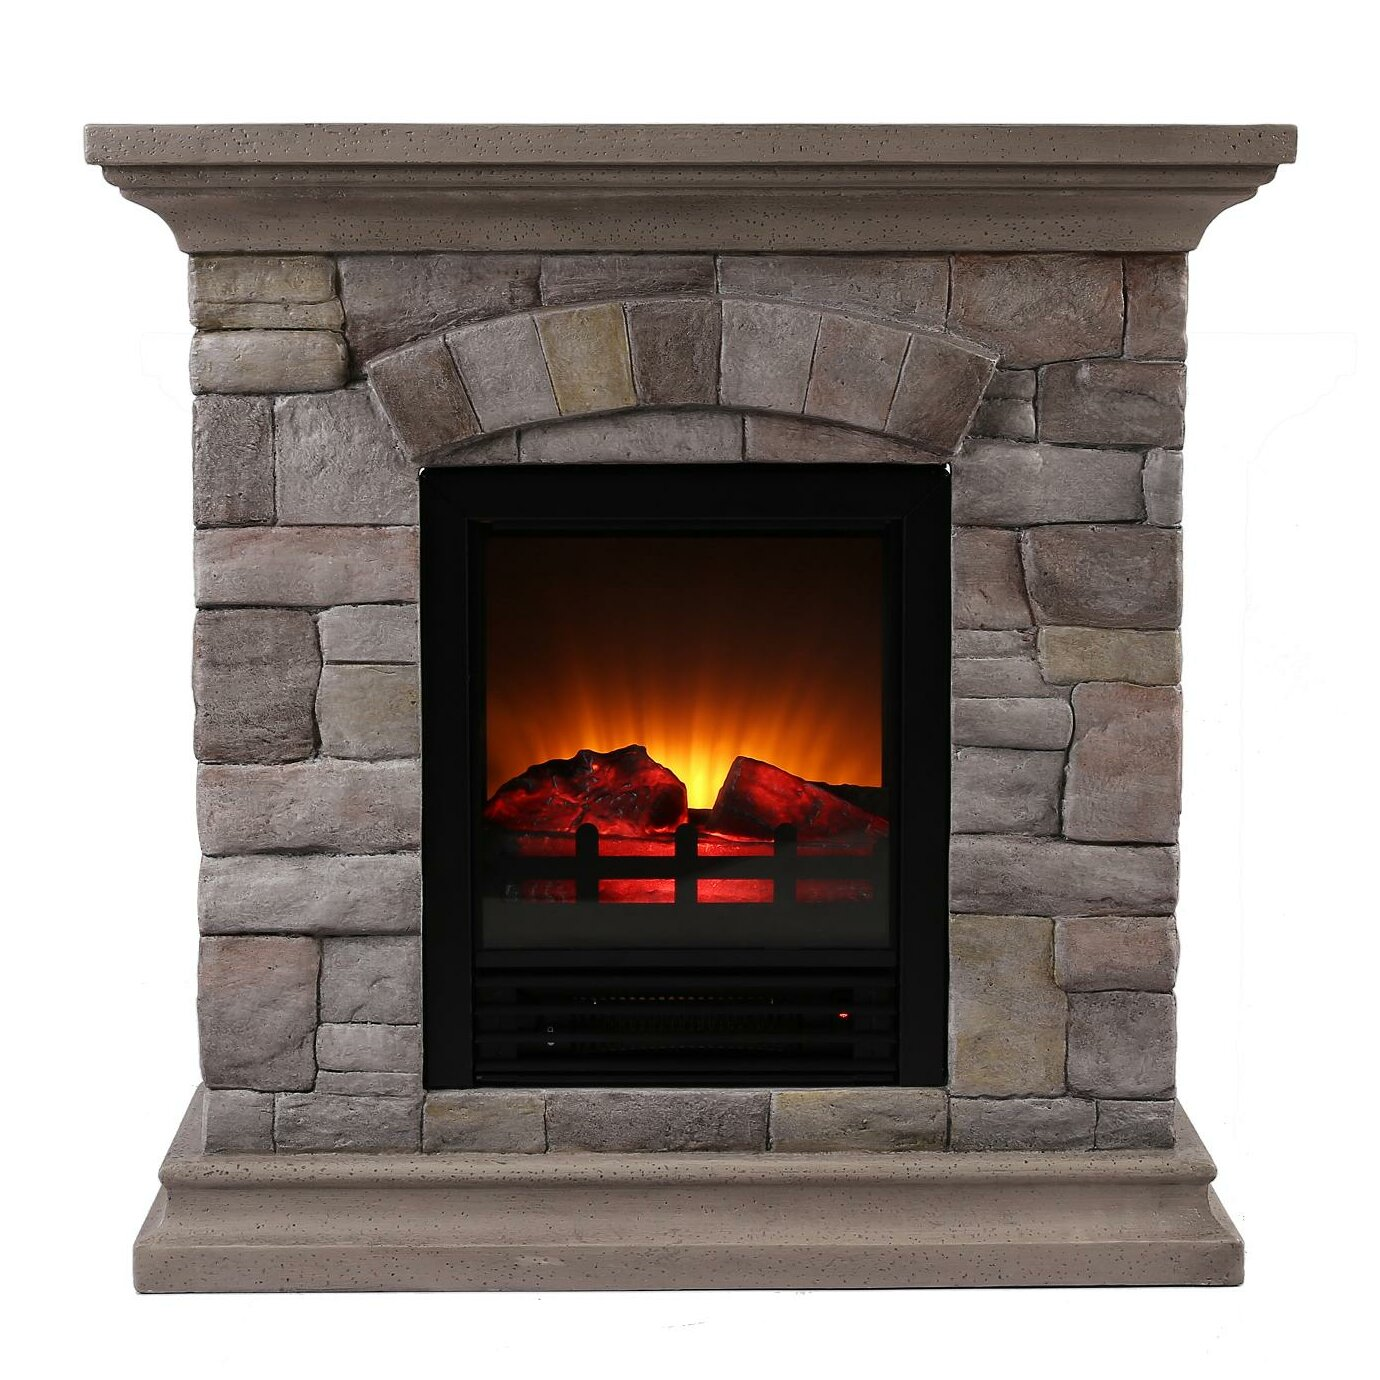 Ok Lighting Portable Electric Fireplace Wayfair . - Electric Fireplace Mantel Packages No Venting Required Dimplex